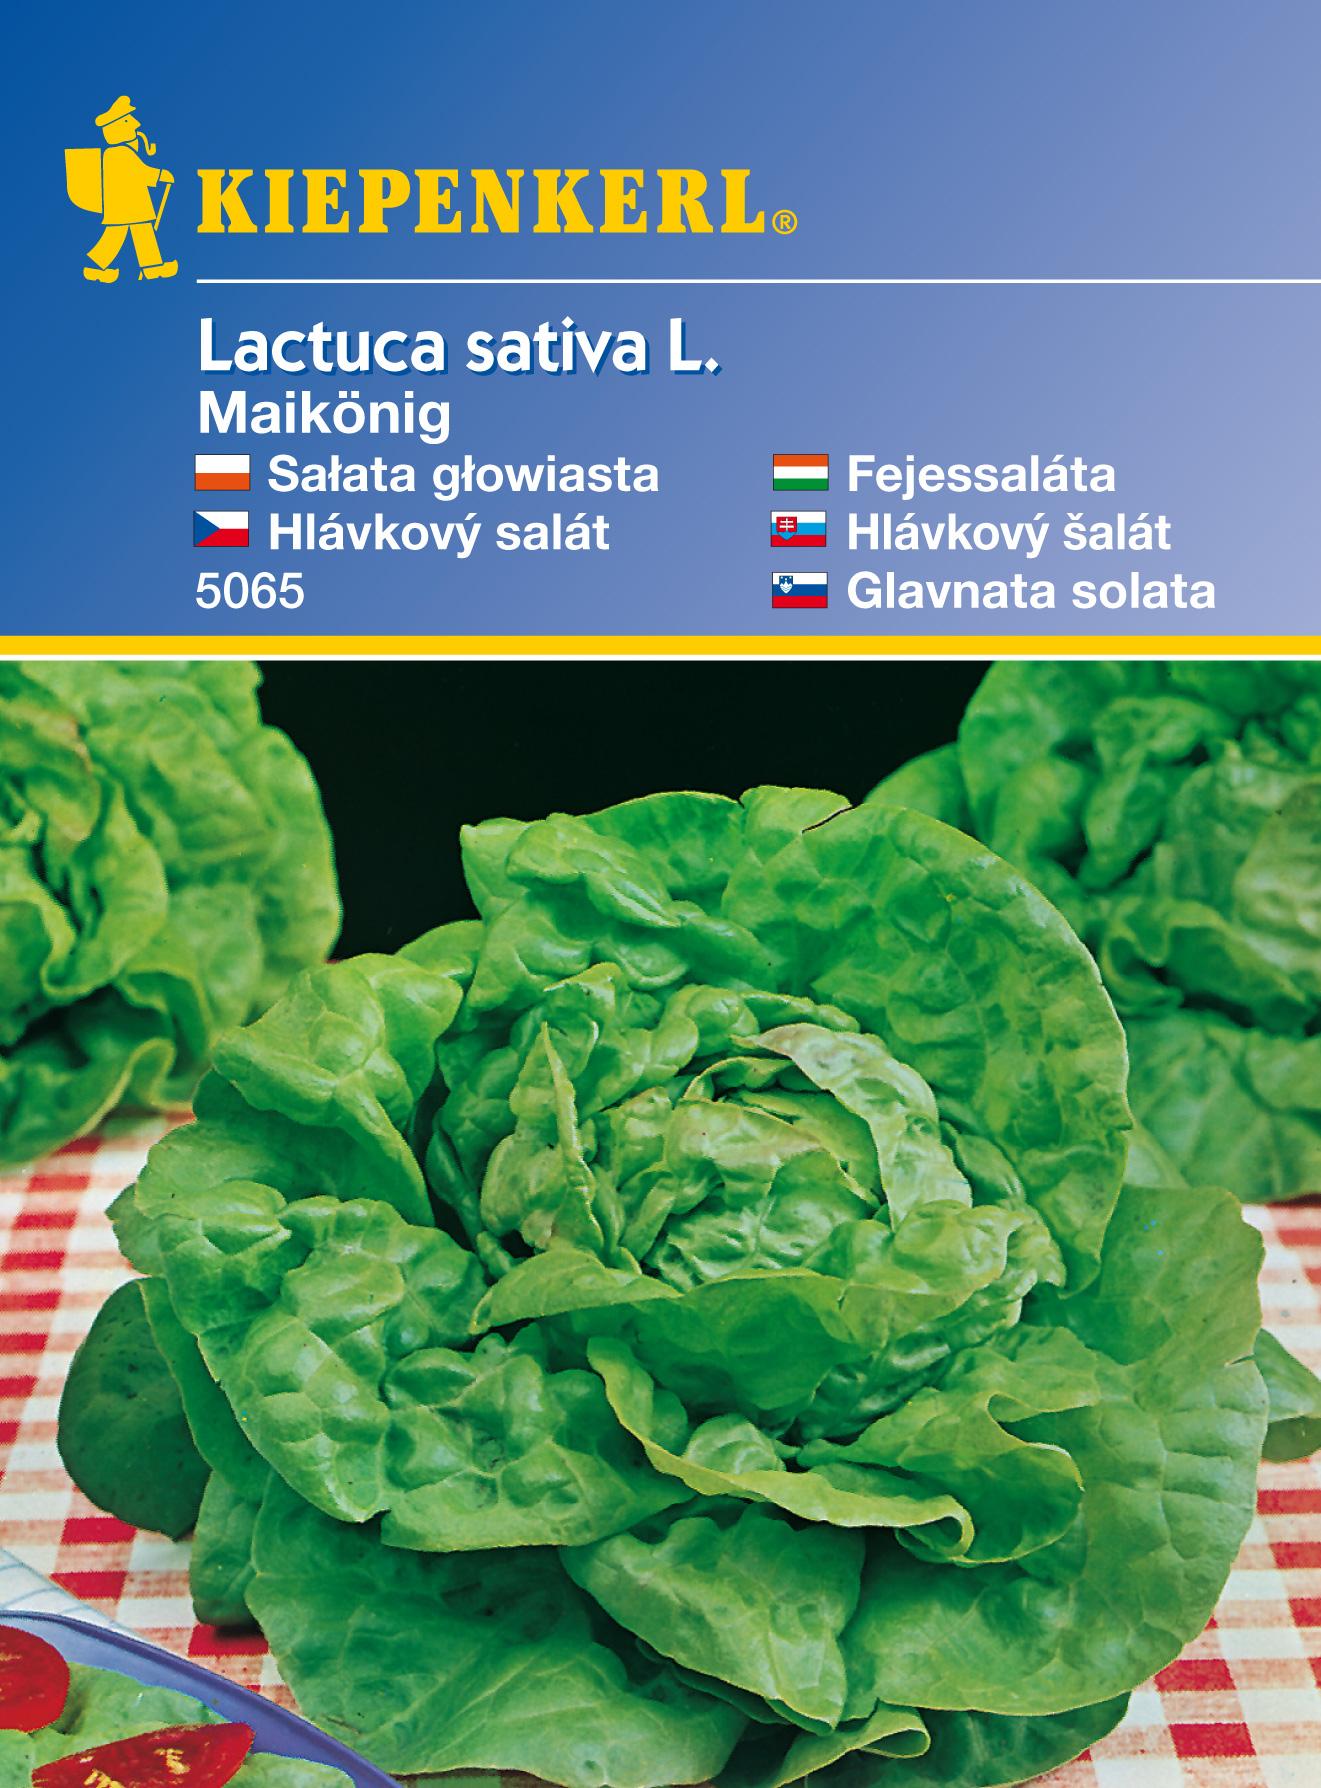 Hlávkový salát Maikönig – semena hlávkového salátu